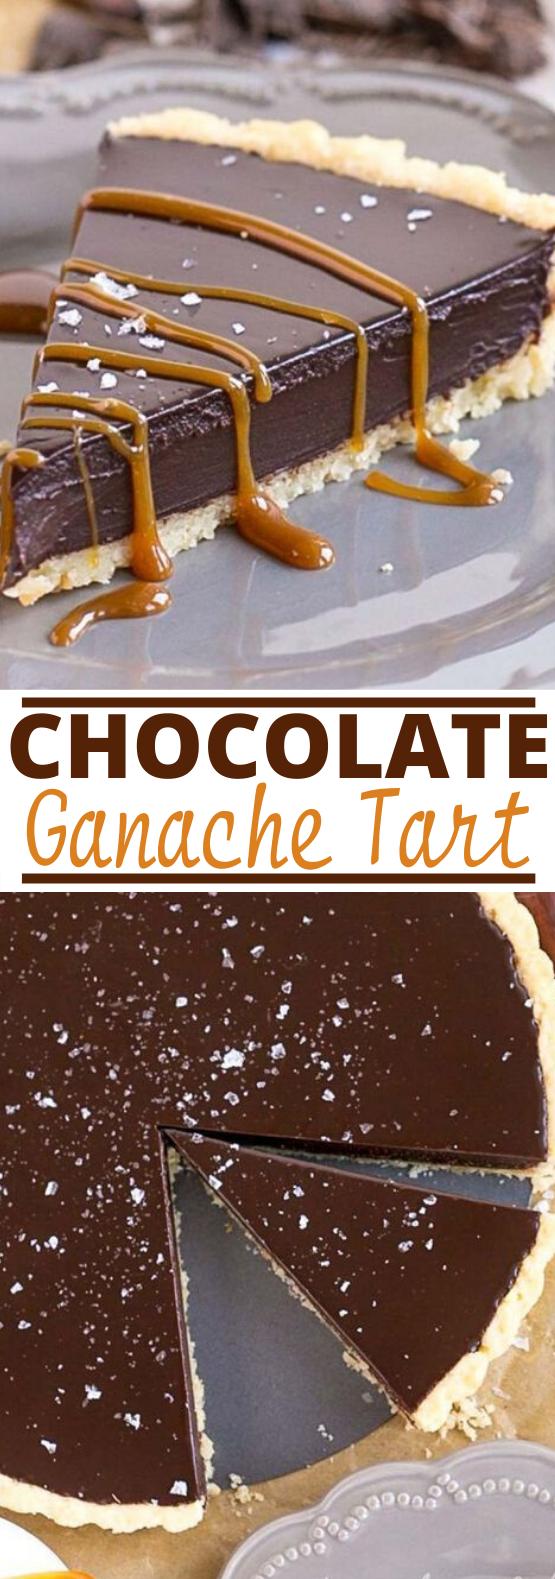 Dark Chocolate Ganache Tart #chocolate #desserts #baking #tart #pie